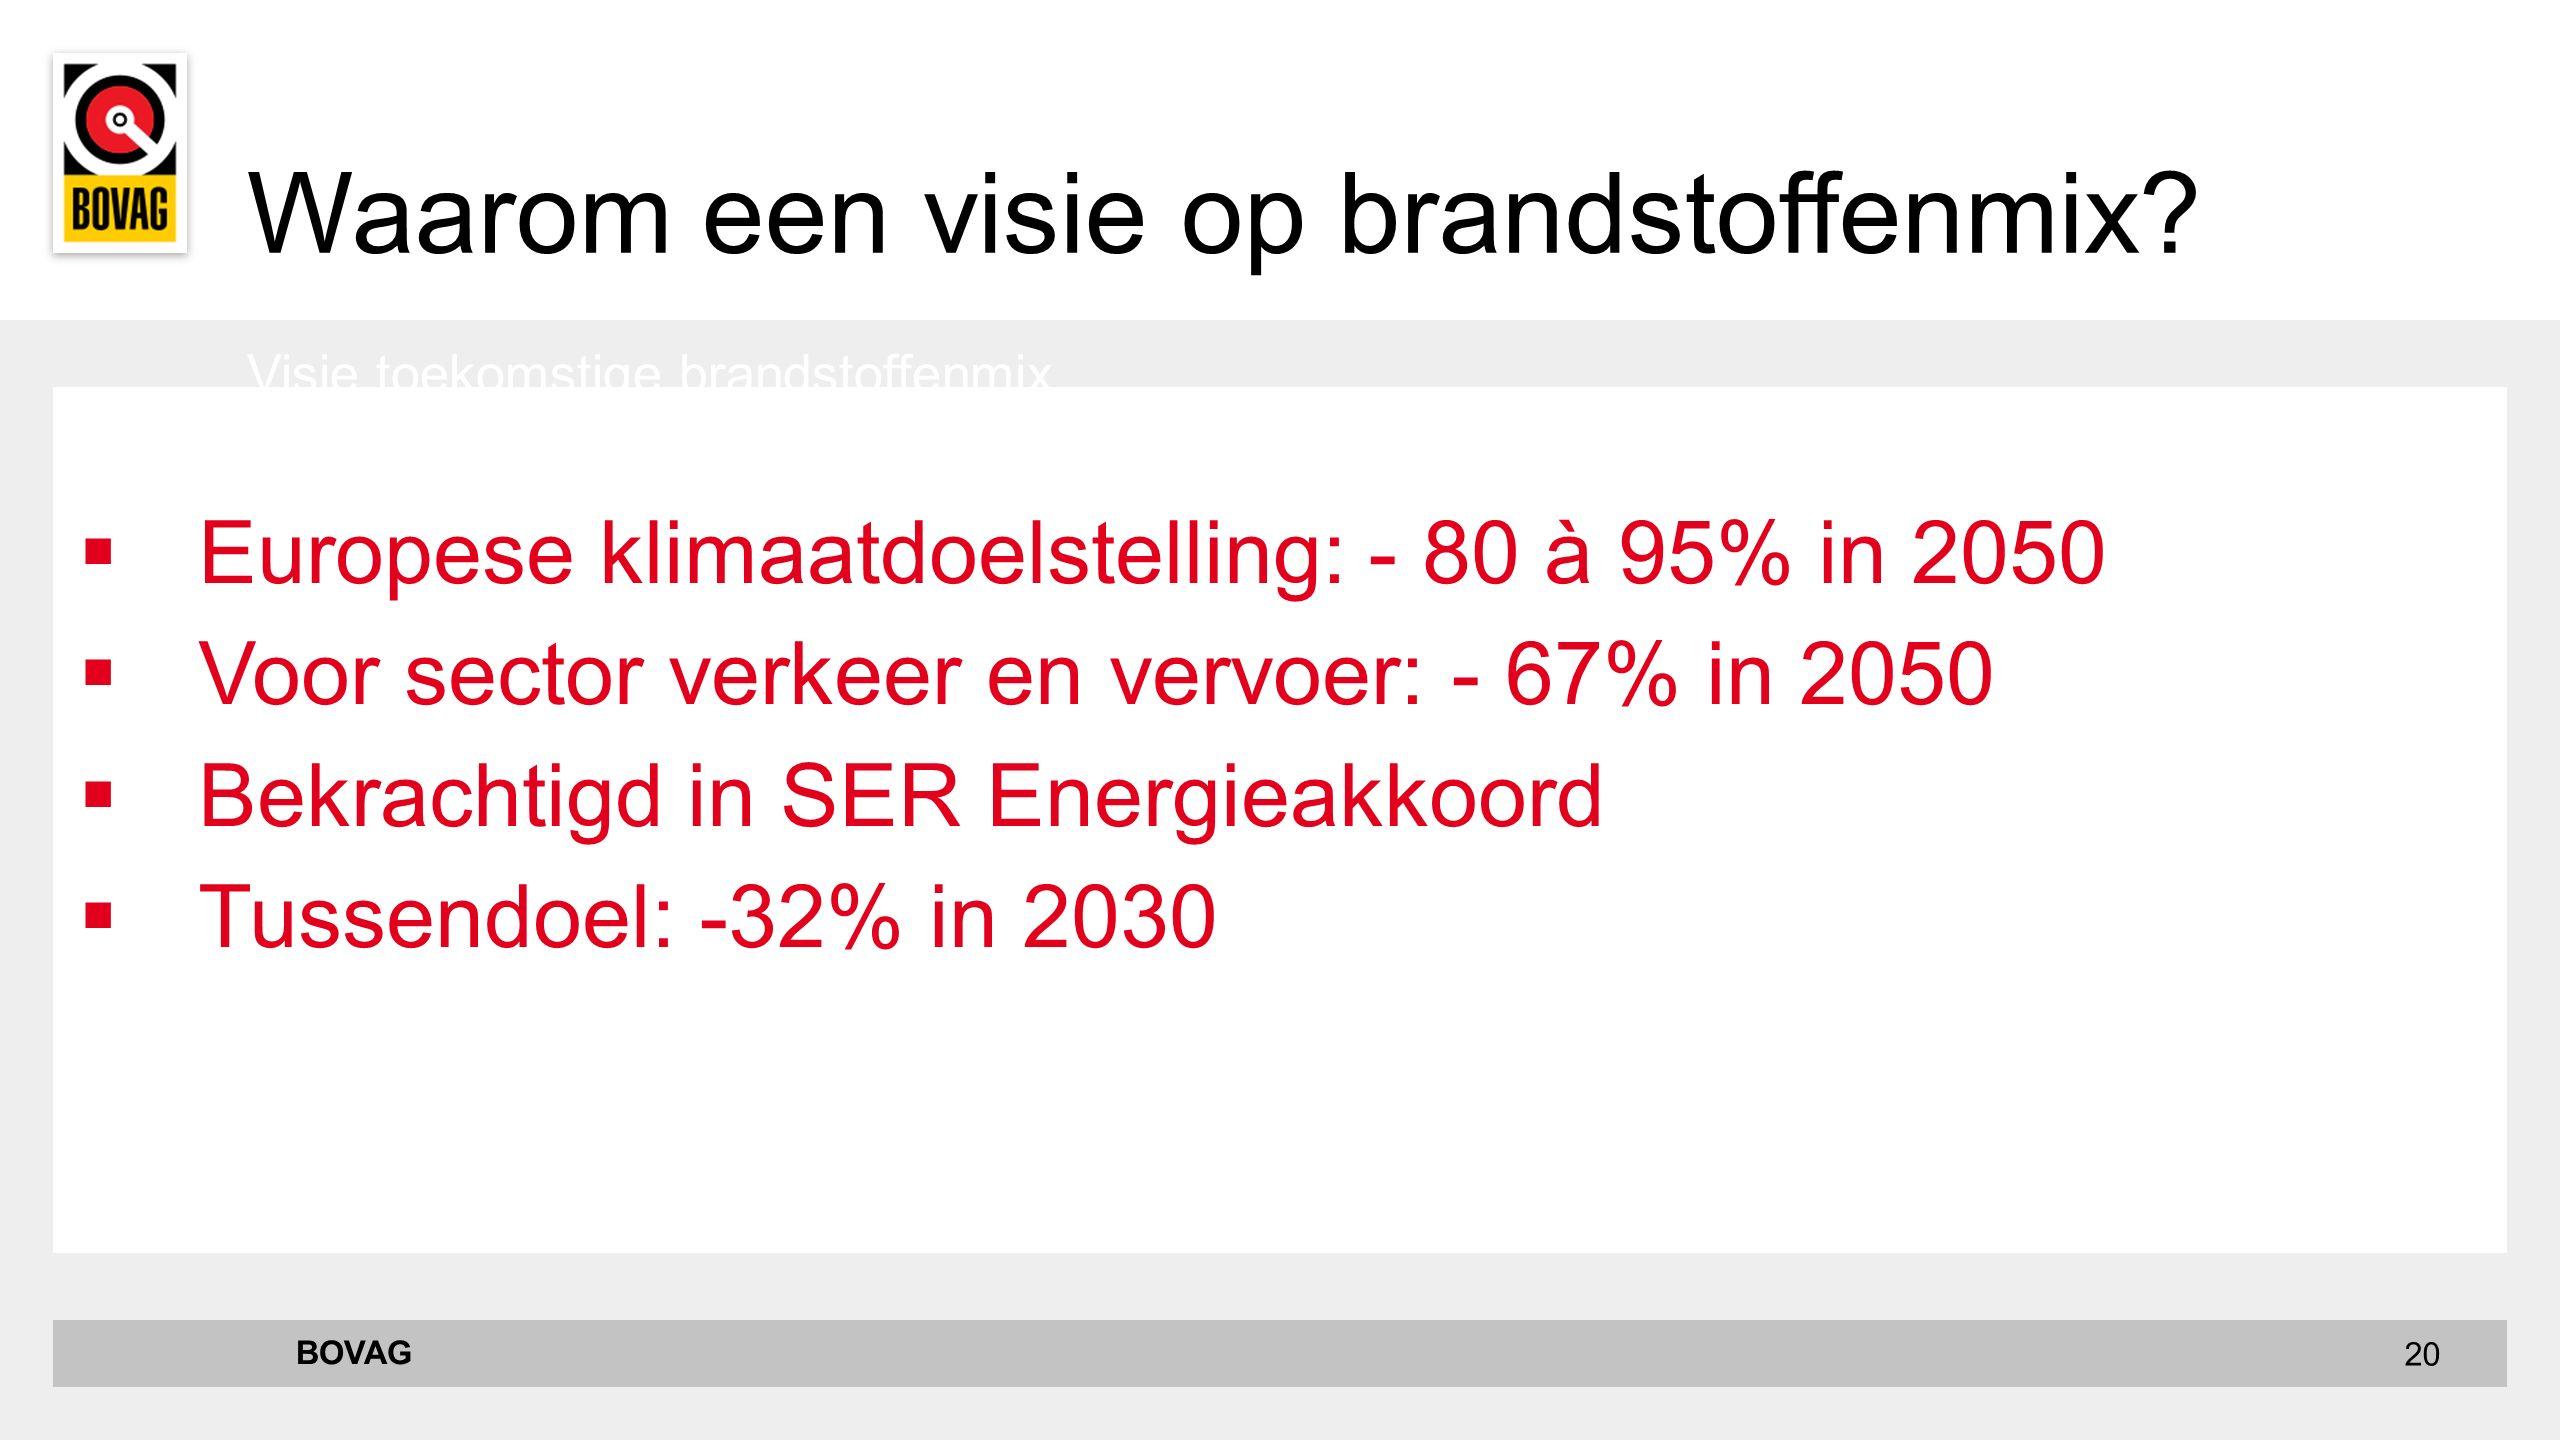 20  Europese klimaatdoelstelling: - 80 à 95% in 2050  Voor sector verkeer en vervoer: - 67% in 2050  Bekrachtigd in SER Energieakkoord  Tussendoel: -32% in 2030 Visie toekomstige brandstoffenmix BOVAG Waarom een visie op brandstoffenmix